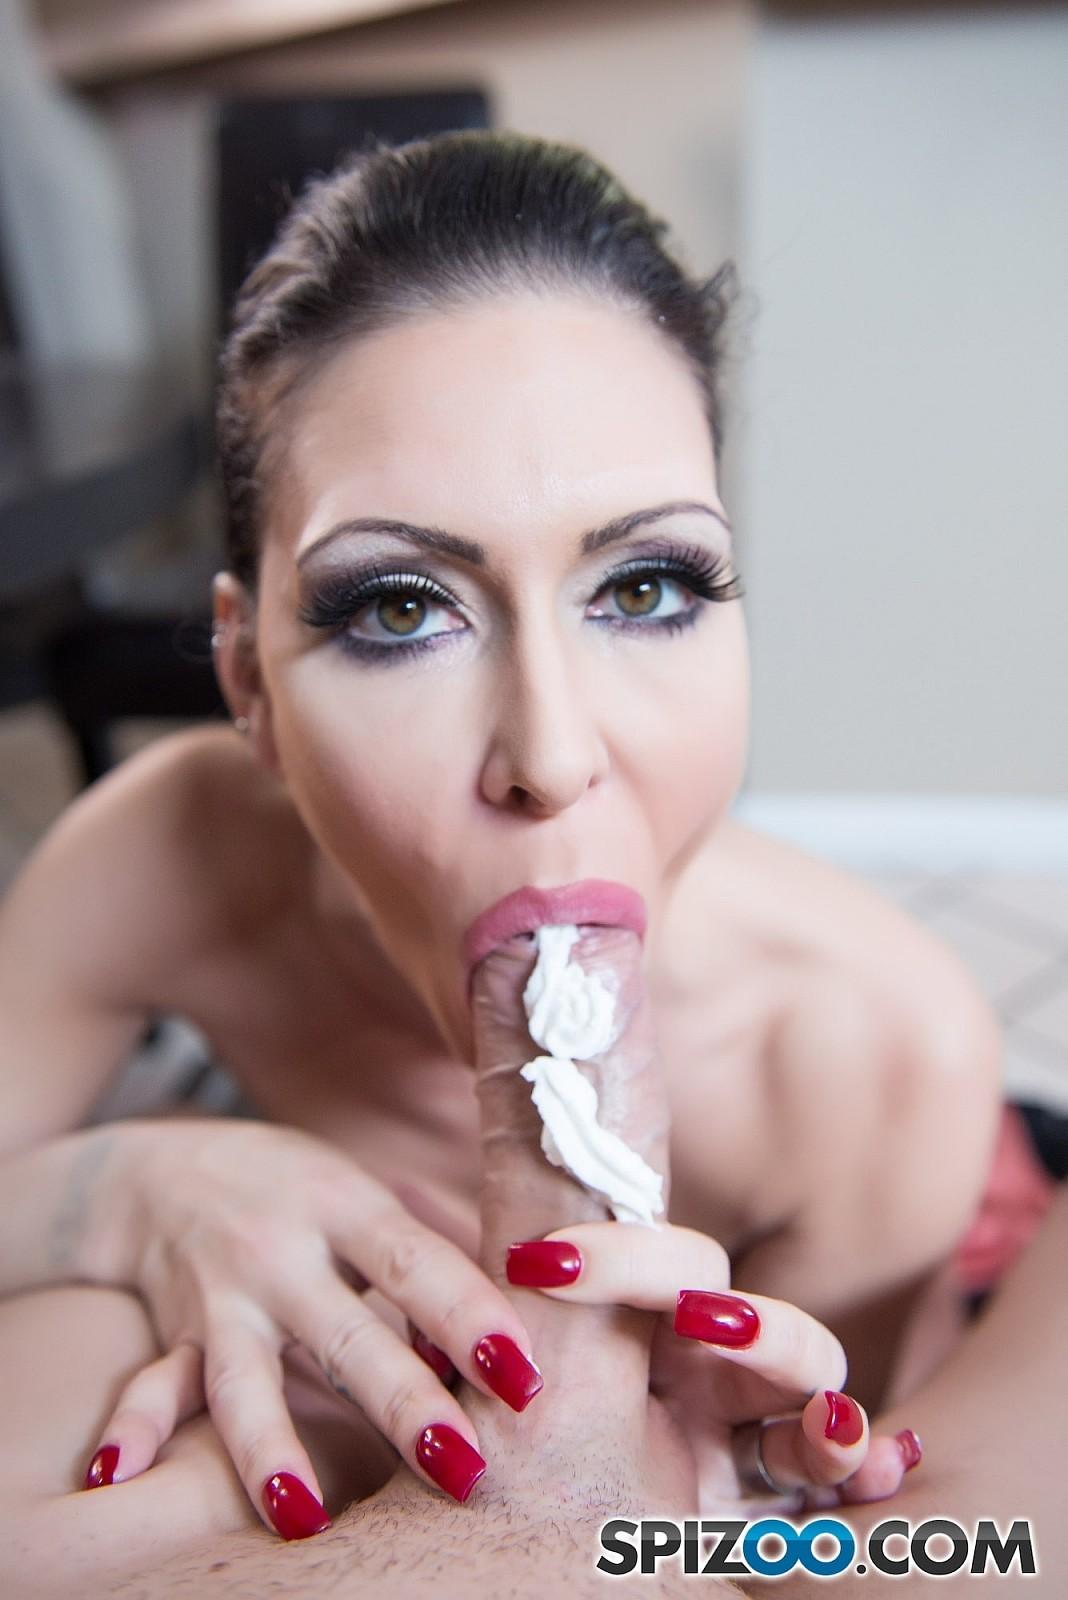 Babes kostenlose Sexfilme Handy Jessica Jaymes Bananensplit